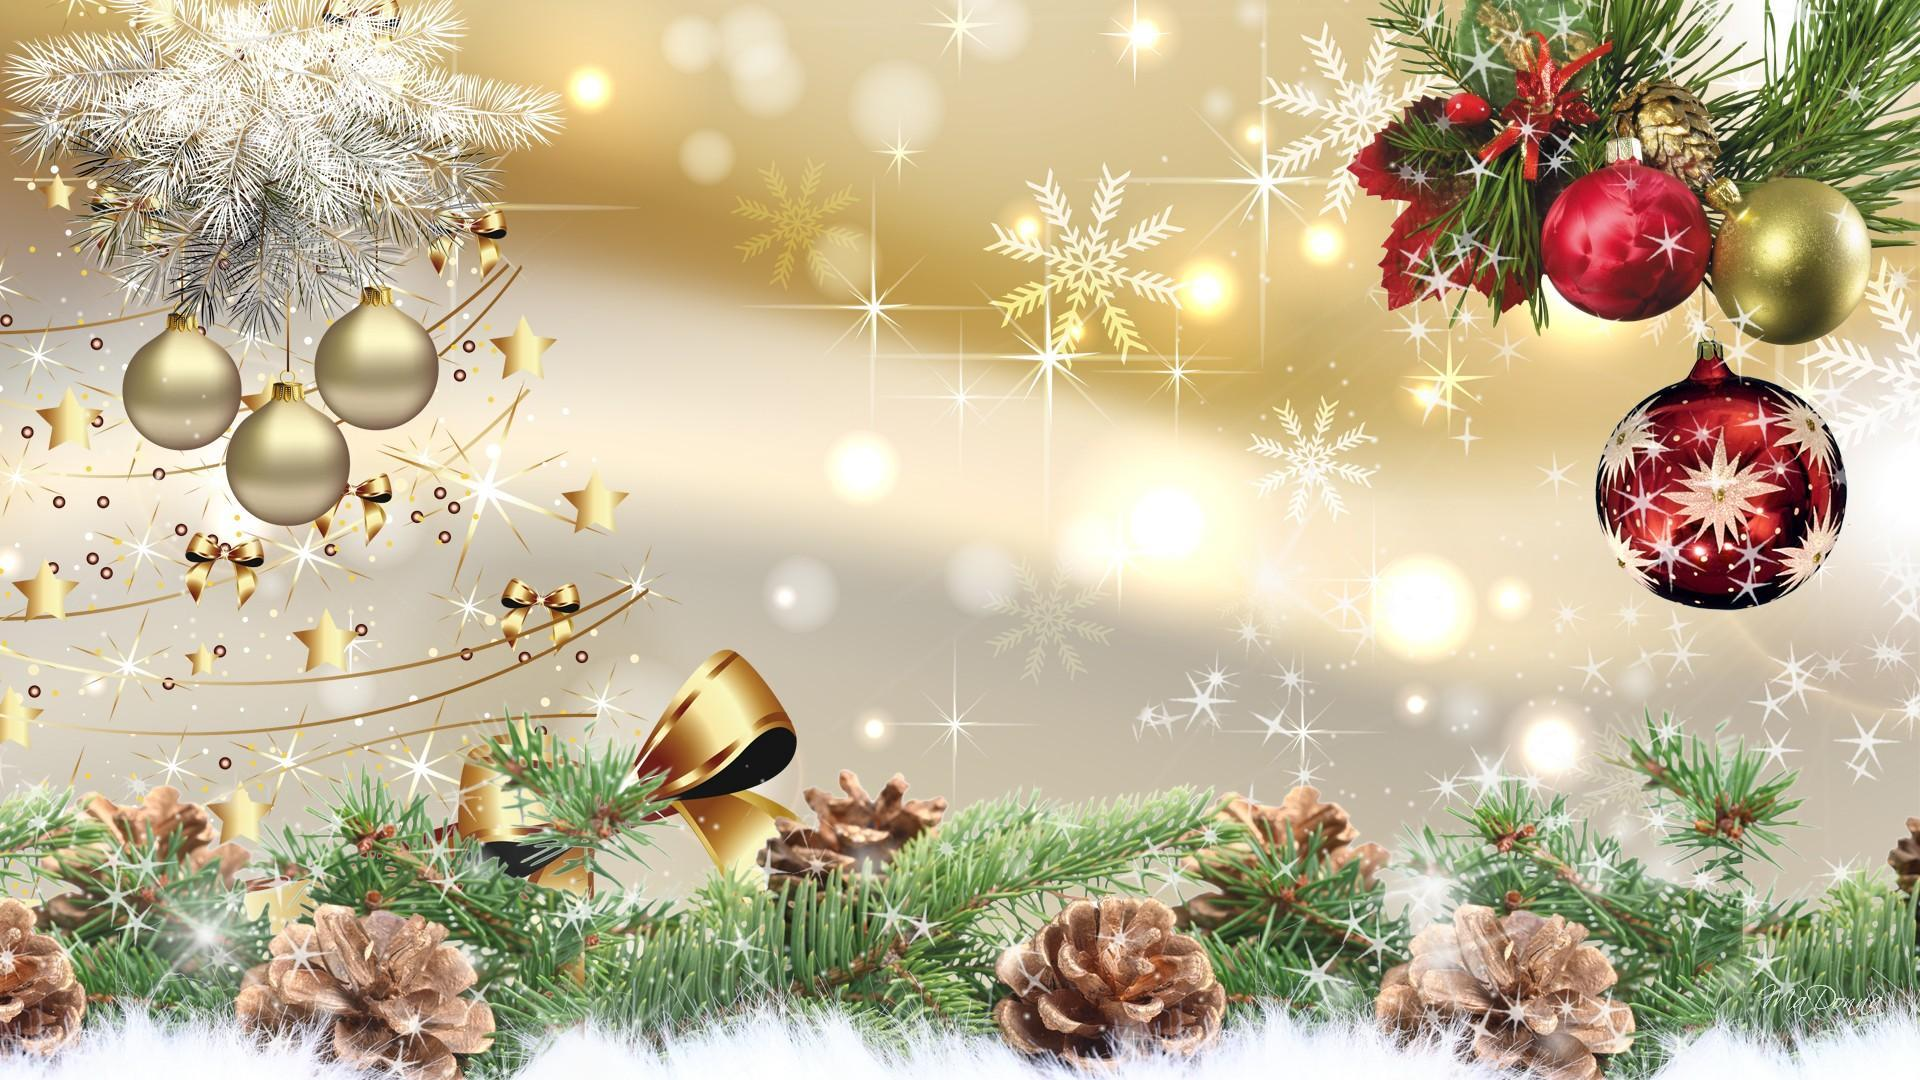 All Car Wallpapers Hd A Christmas So Bright Hd Desktop Wallpaper Widescreen